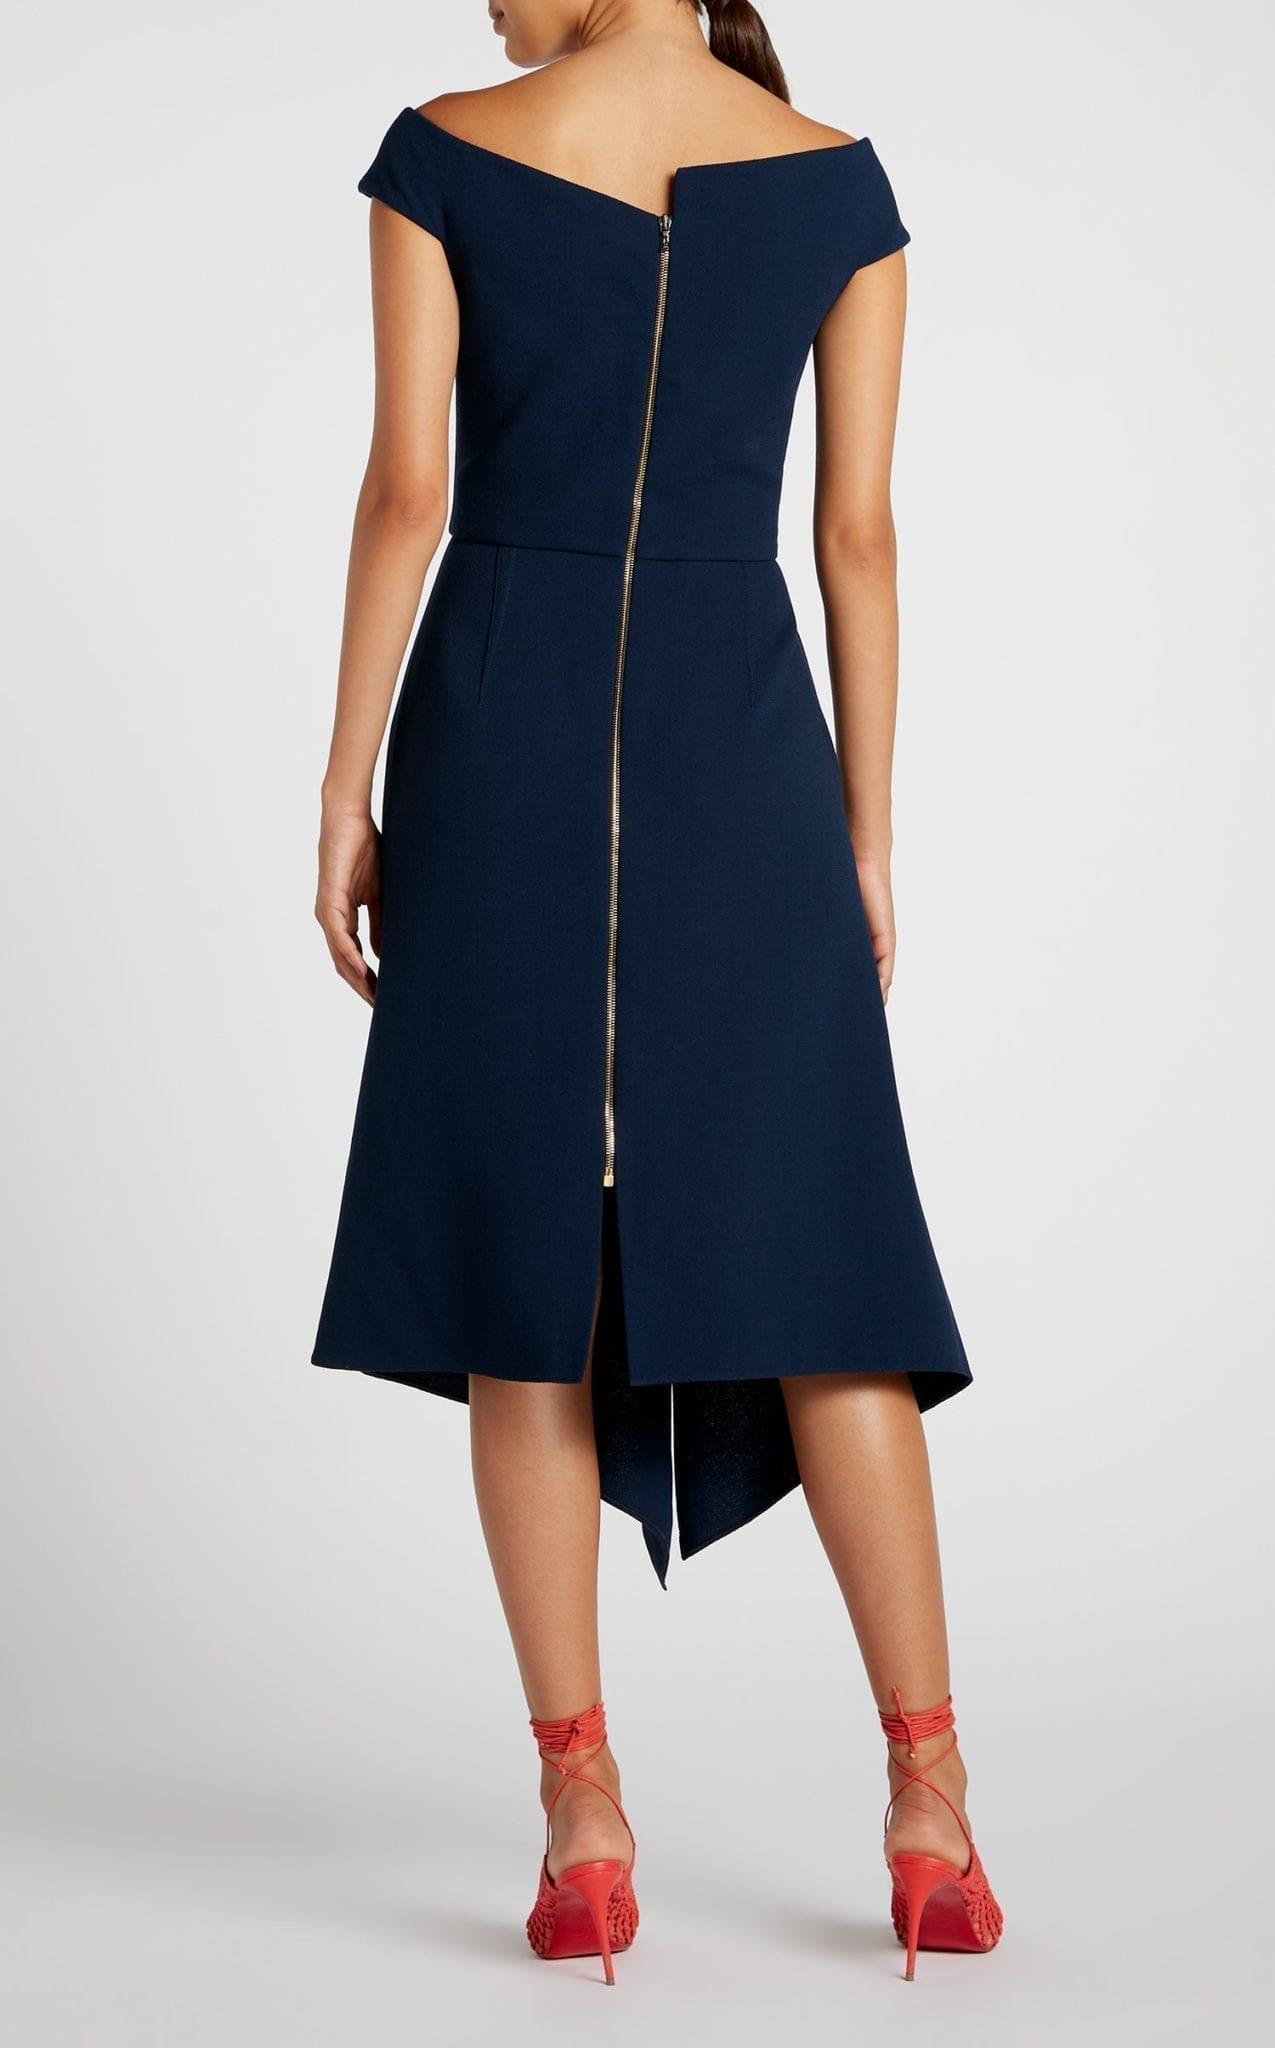 ROLAND MOURET Barwick Navy Dress 4